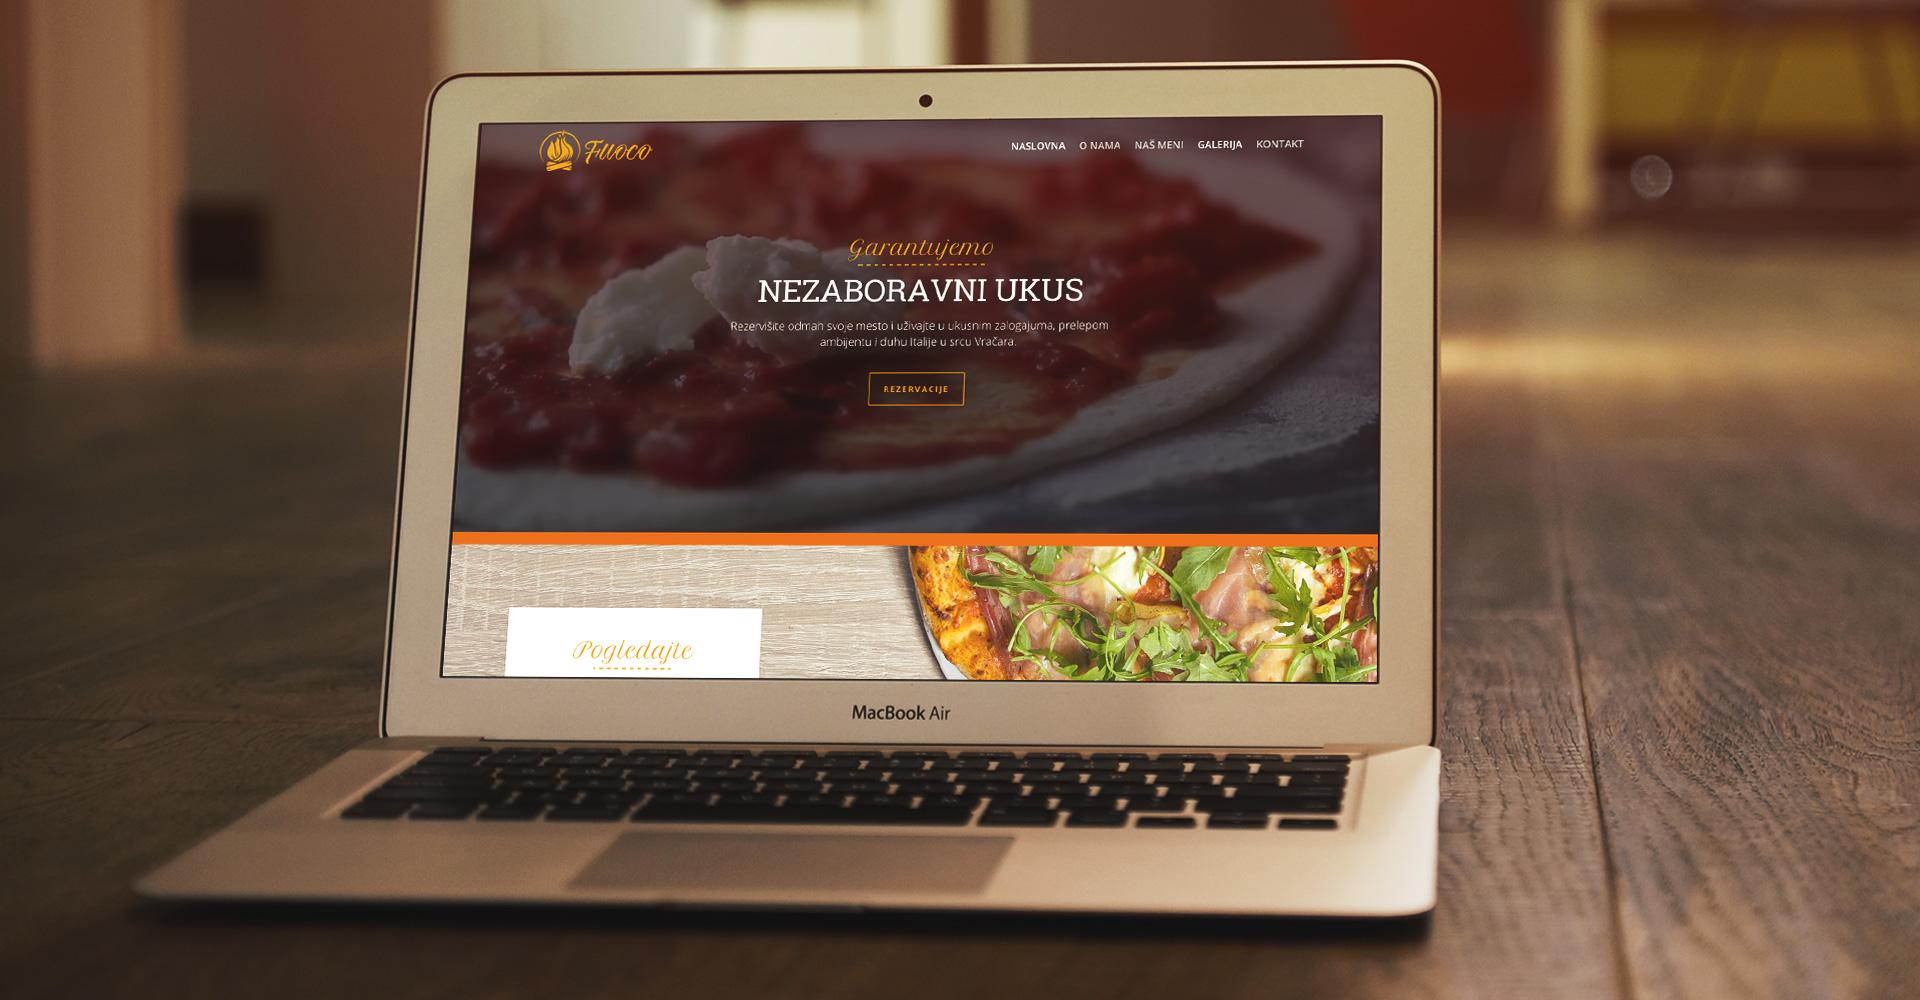 Dizajn web sajta za italijanski restoran Fuoco, Beograd